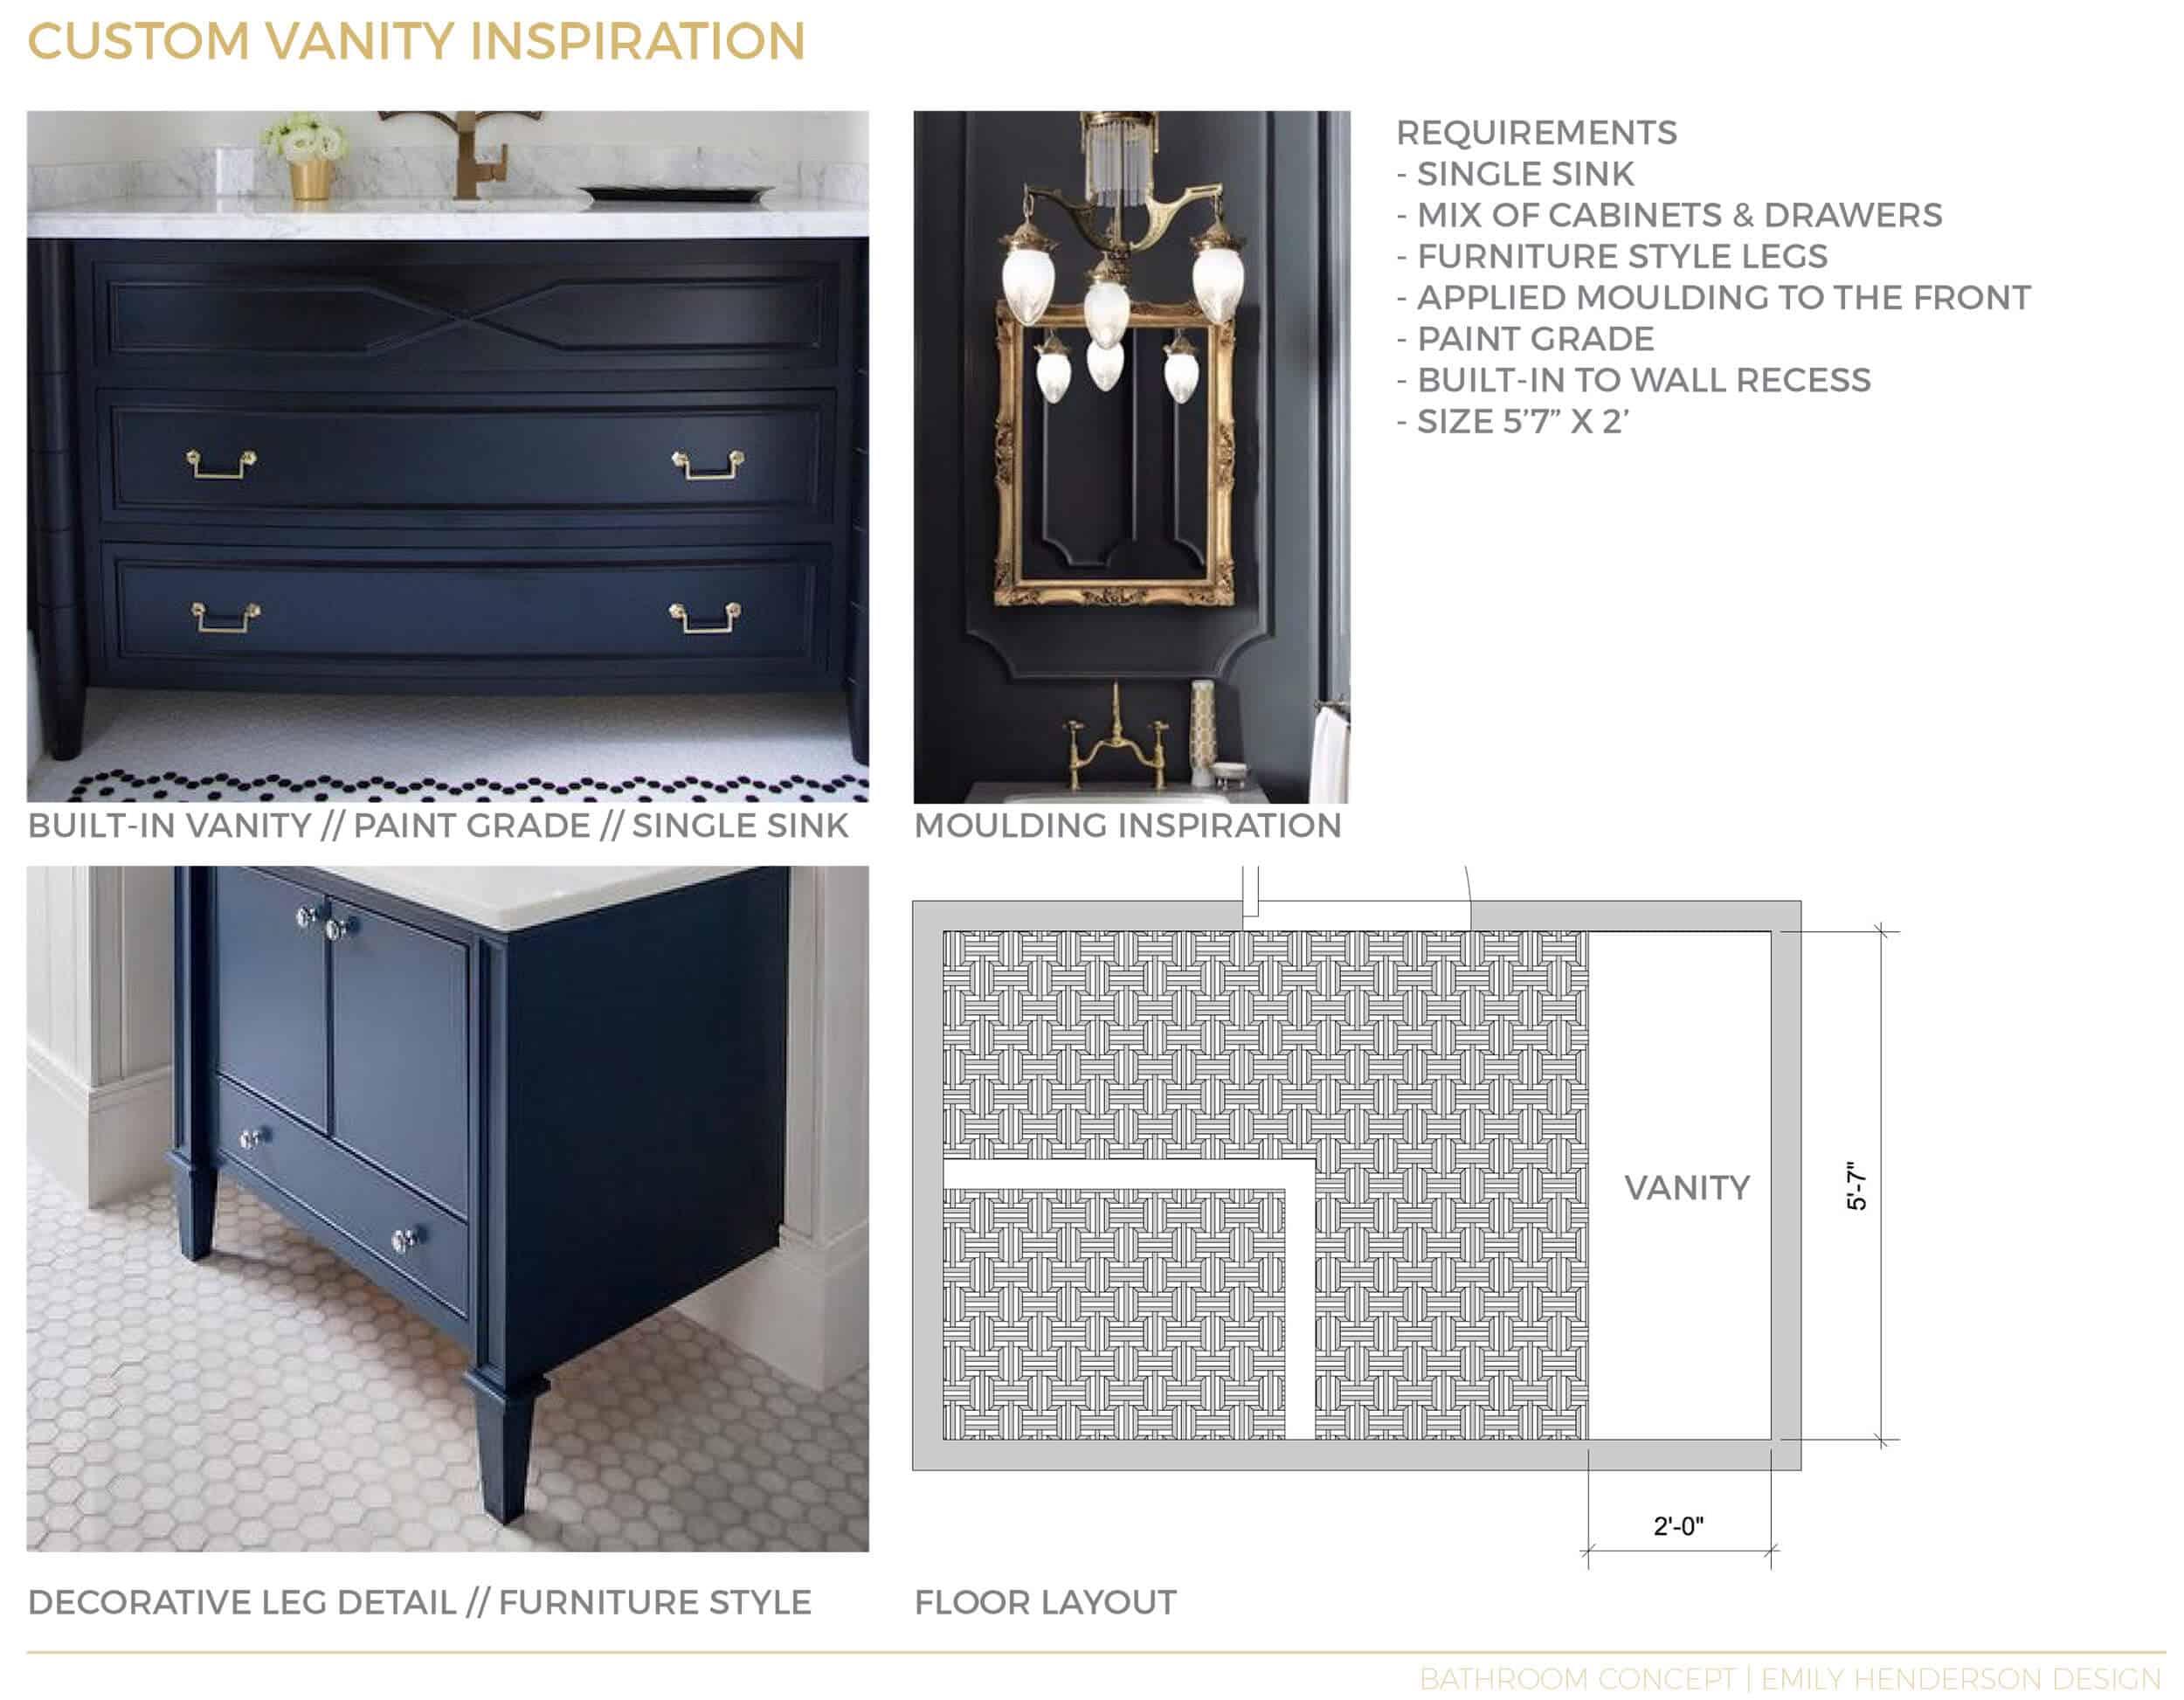 Emily-Henderson_Silver-Lake-Hills-Home_Master-Bathroom_Intro_Custom-Vanity-Inspo